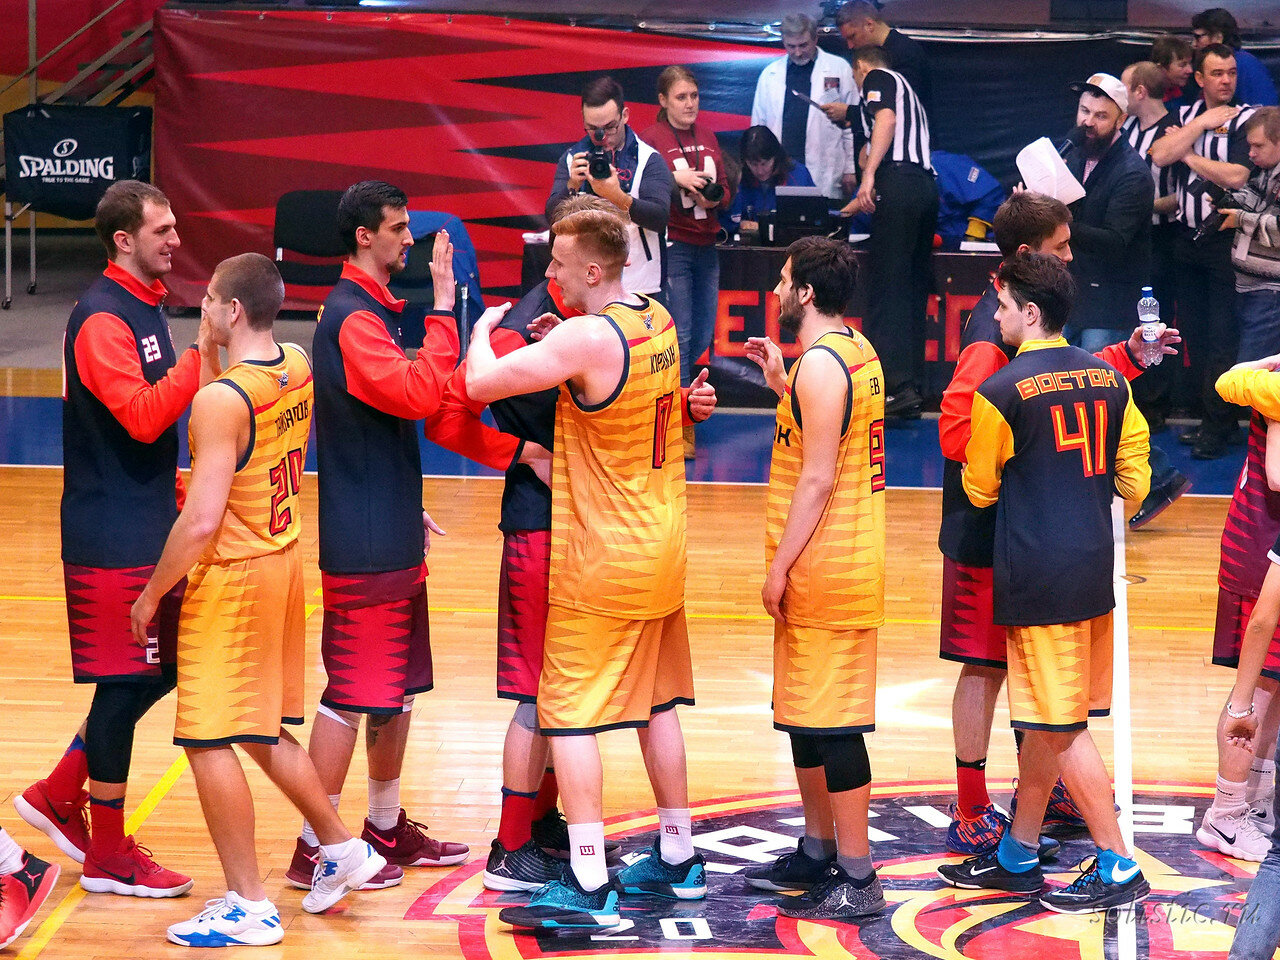 149 Матч звезд АСБ 2018 (ассоциации студенческого баскетбола)